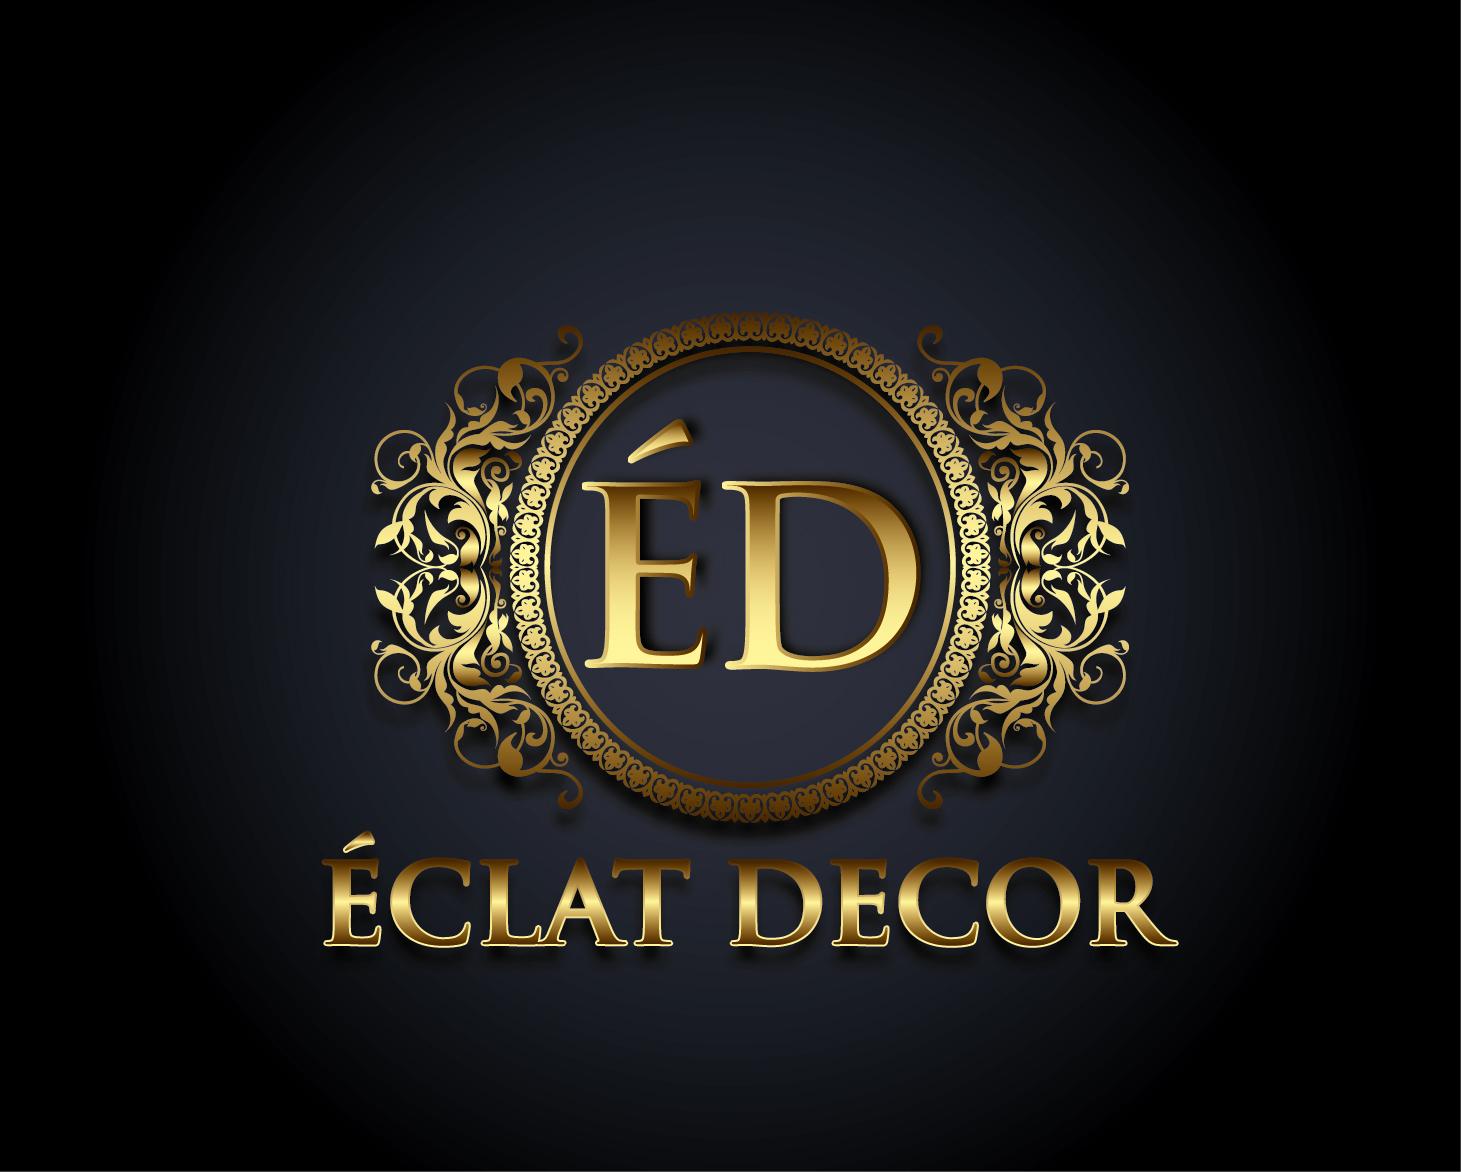 Logo Design by VENTSISLAV KOVACHEV - Entry No. 58 in the Logo Design Contest Imaginative Logo Design for Éclat Decor.